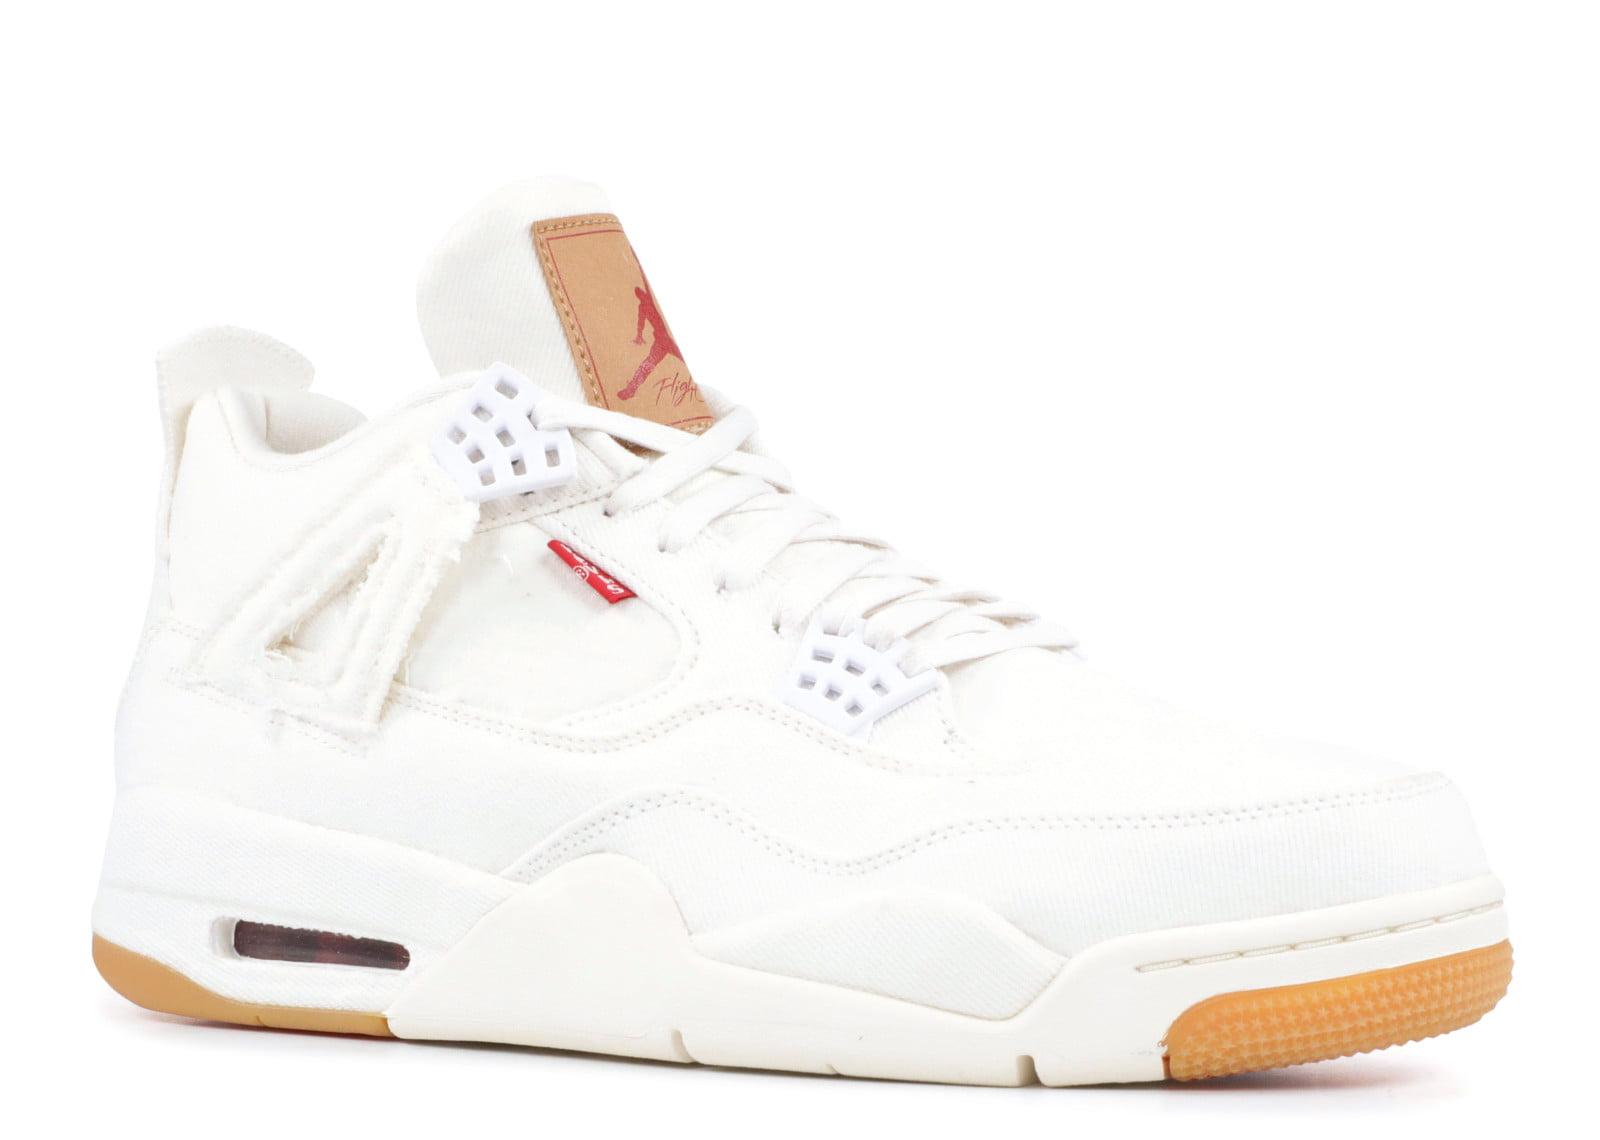 Air Jordan 4 Retro Levis Nrg 'Levi's